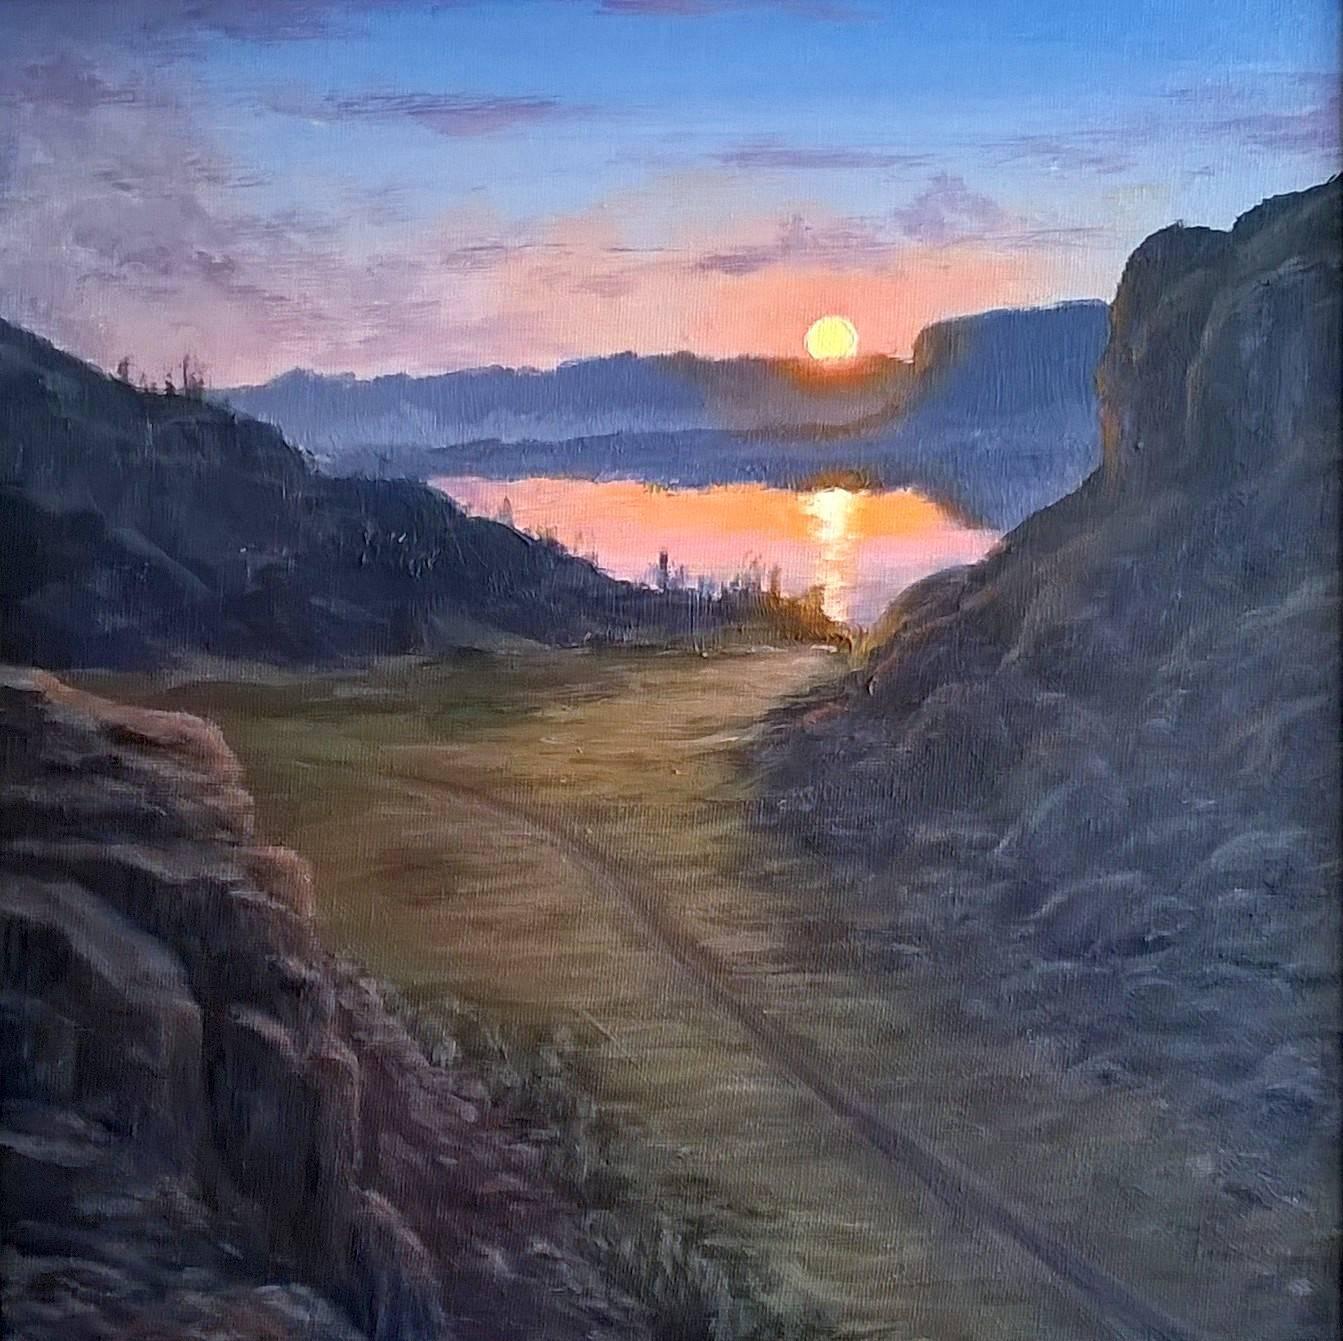 Northrup Canyon Sunset